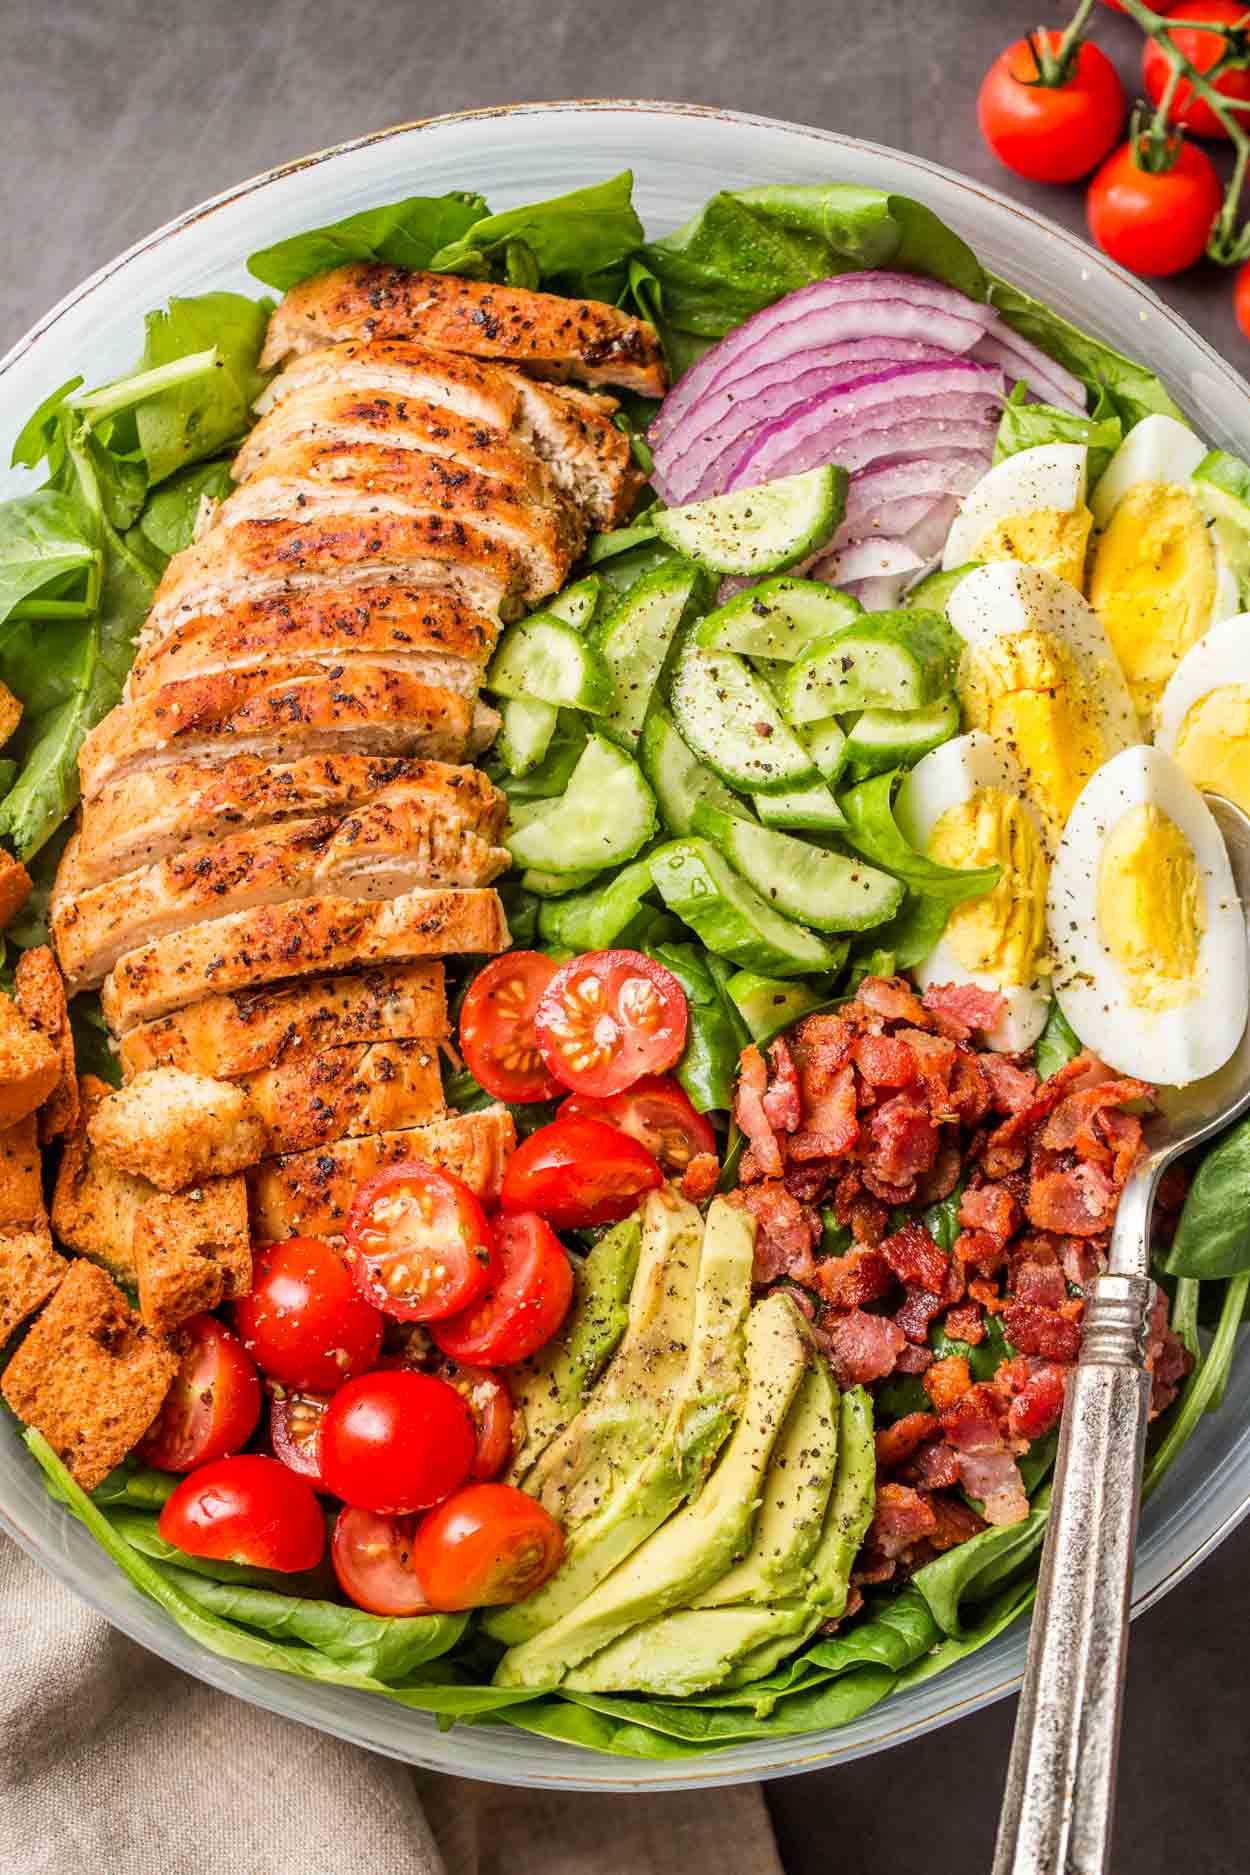 Spinach Salad With Chicken And Avocado Valentina S Corner